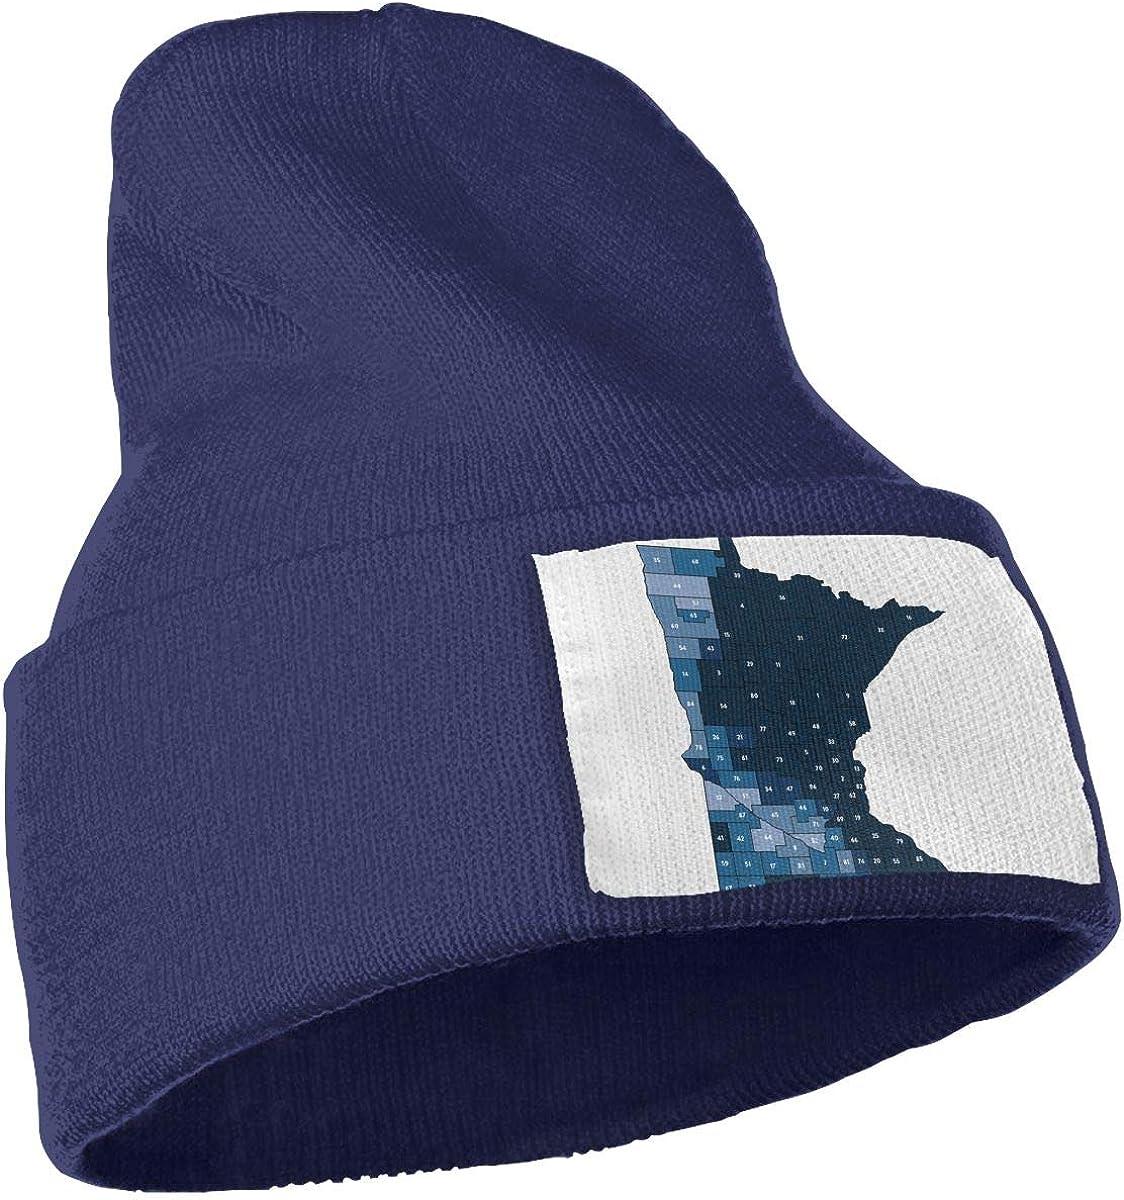 QZqDQ State of Minnesota Unisex Fashion Knitted Hat Luxury Hip-Hop Cap